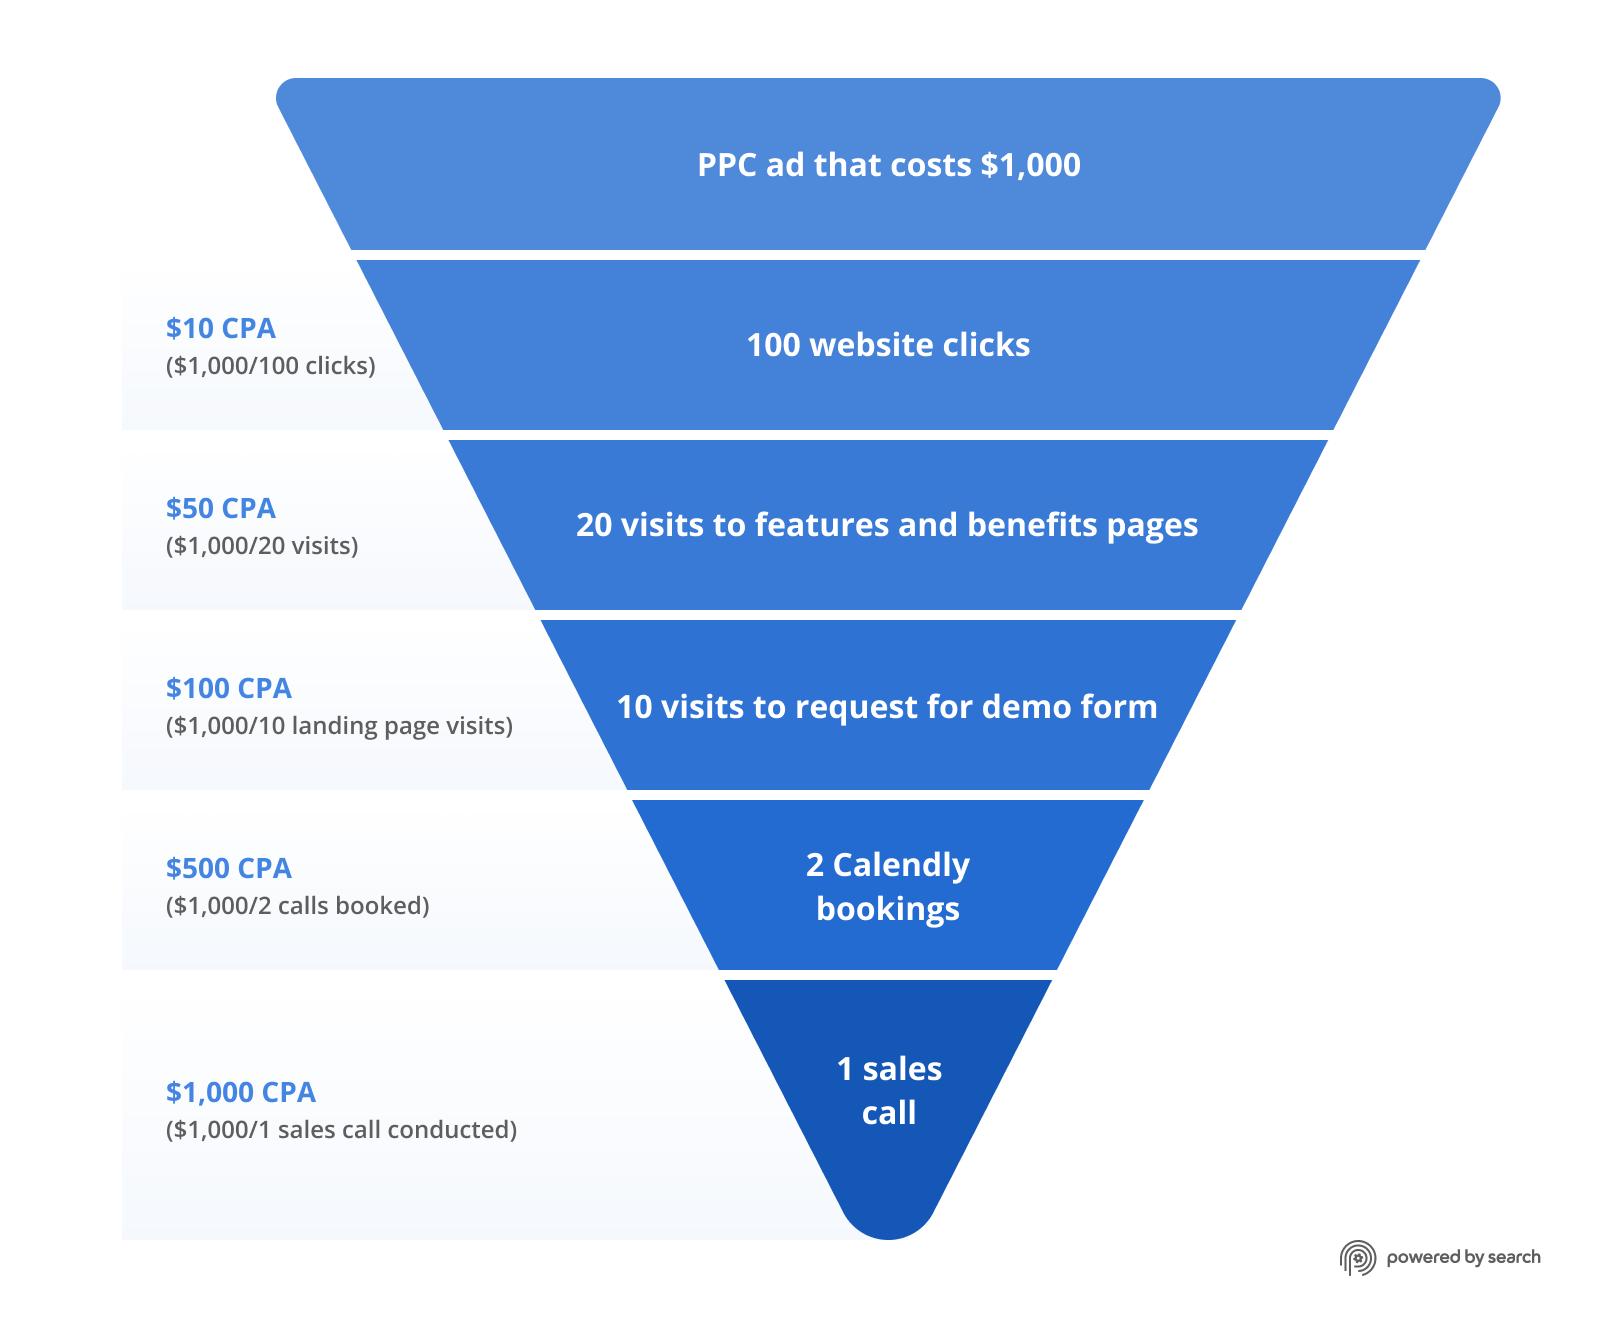 B2B SaaS marketing analytics examples: $10 CPA to $1000 CPA upside-down pyramid